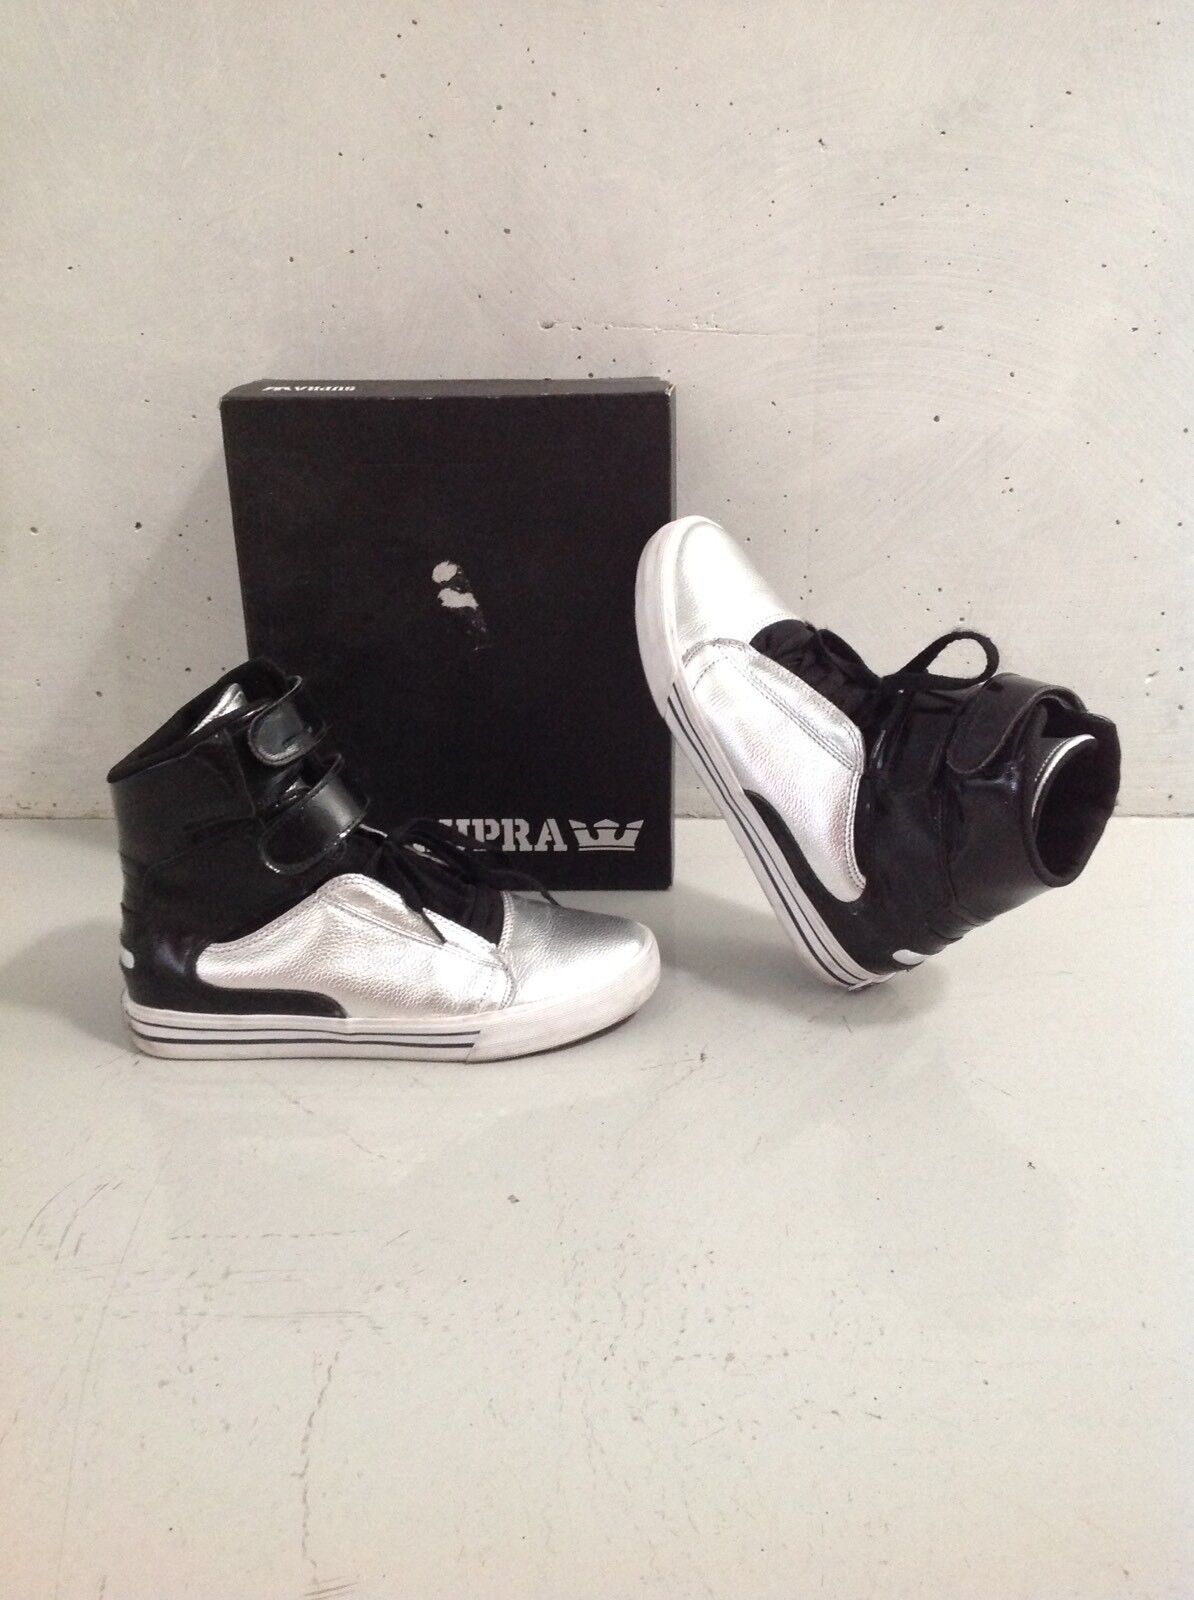 Supra Sneaker High Top Silber 42/42.5 Design Schwarz Silver Schuhe